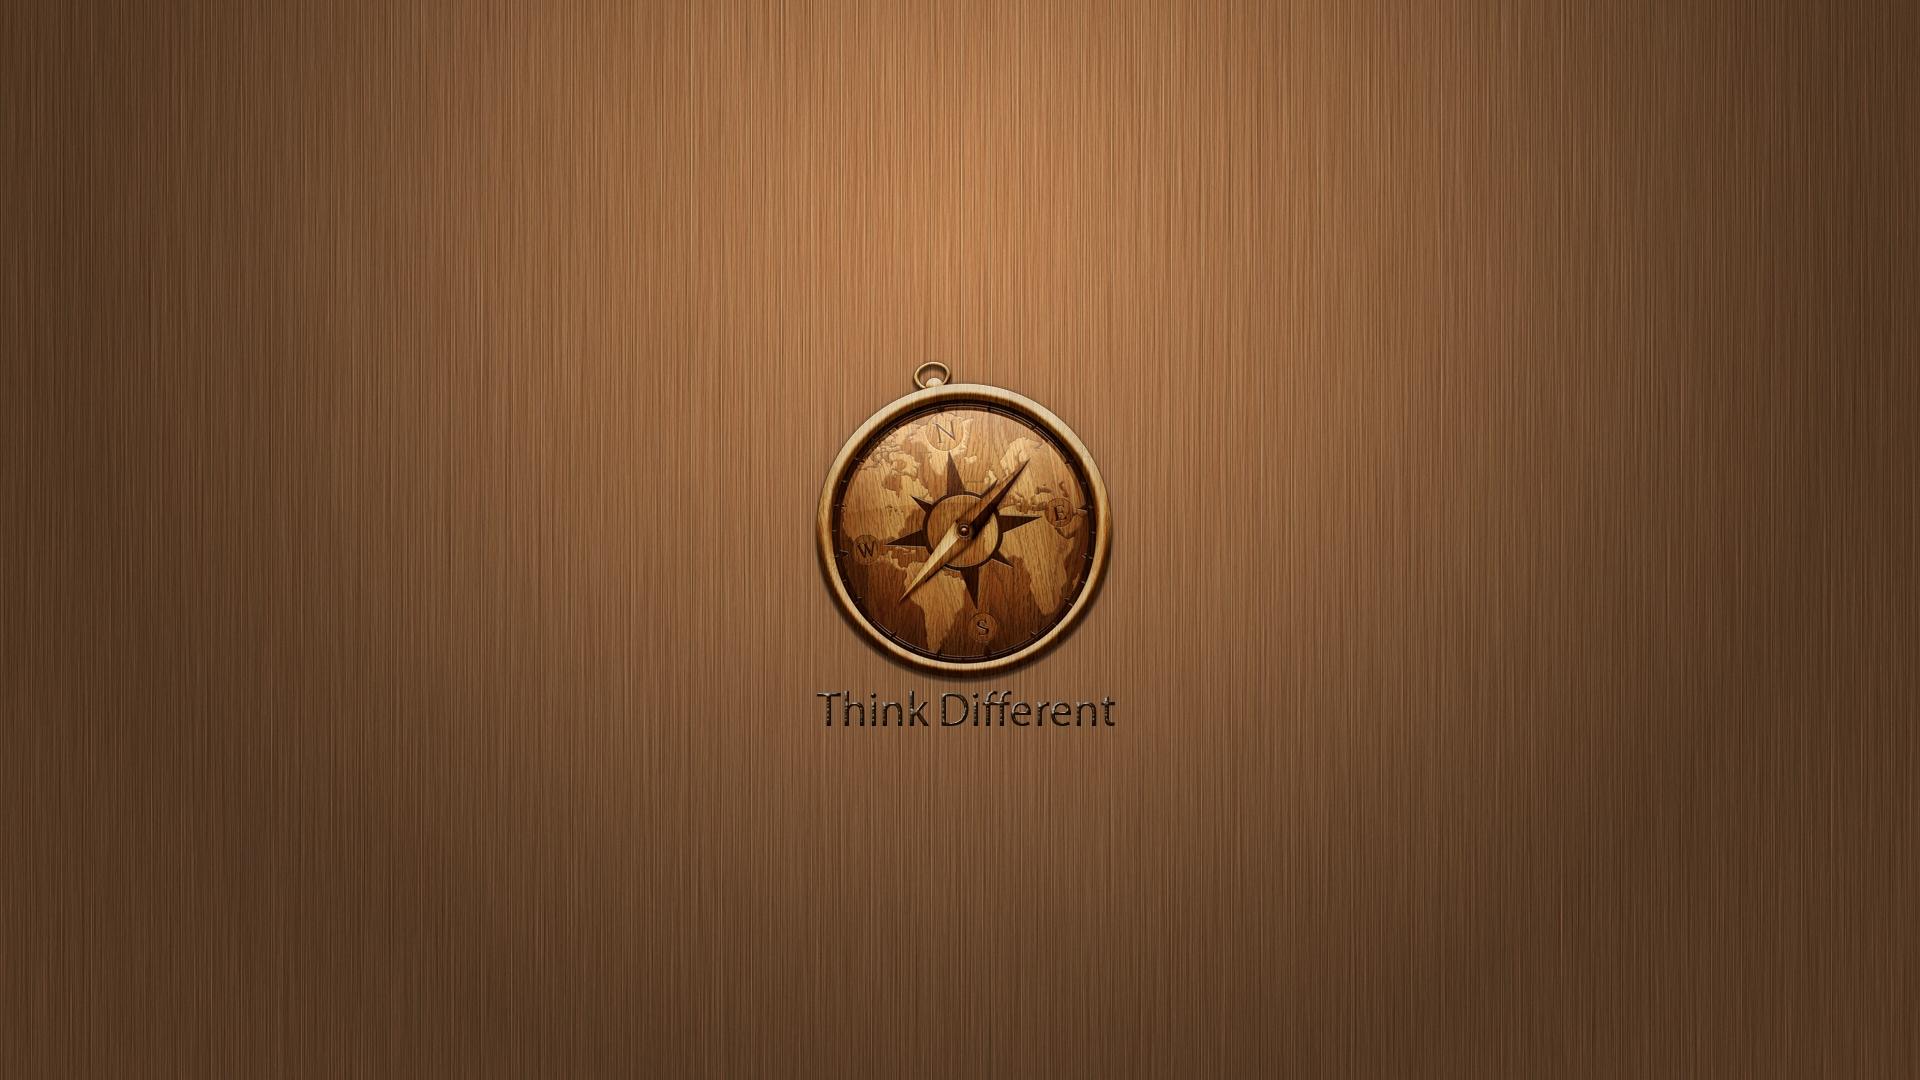 apple_safari_browser_internet_mac_30916_1920x1080